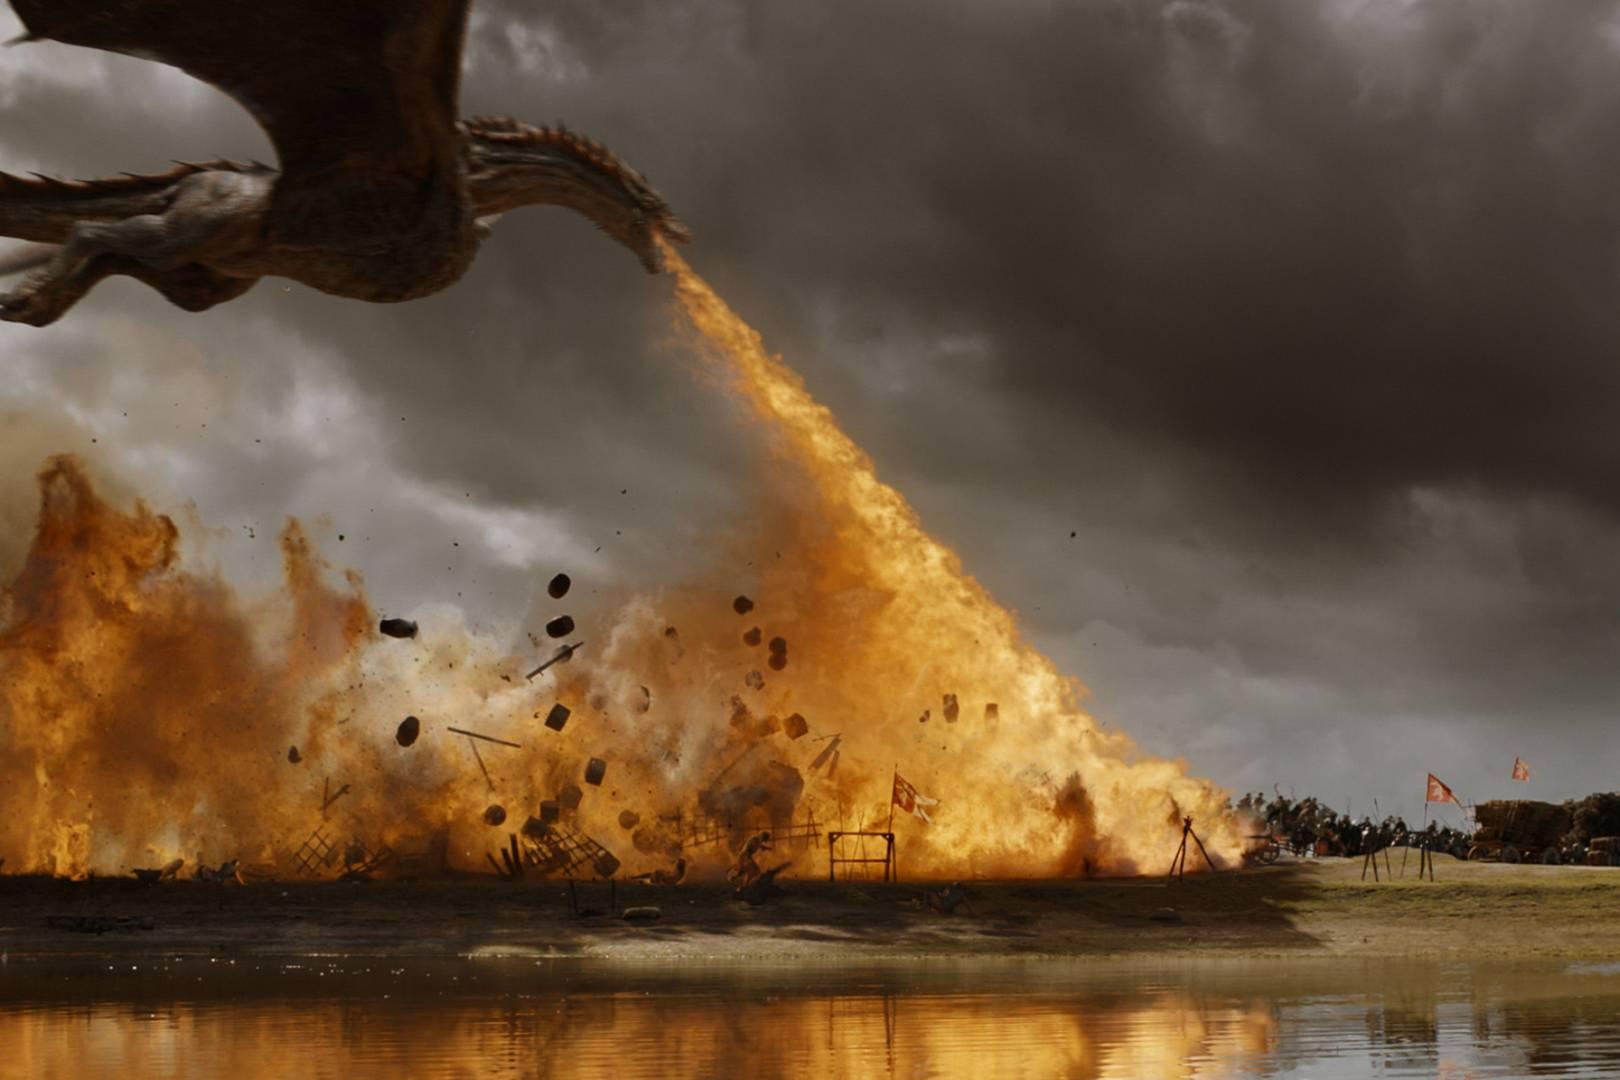 tentang game of thrones season 8